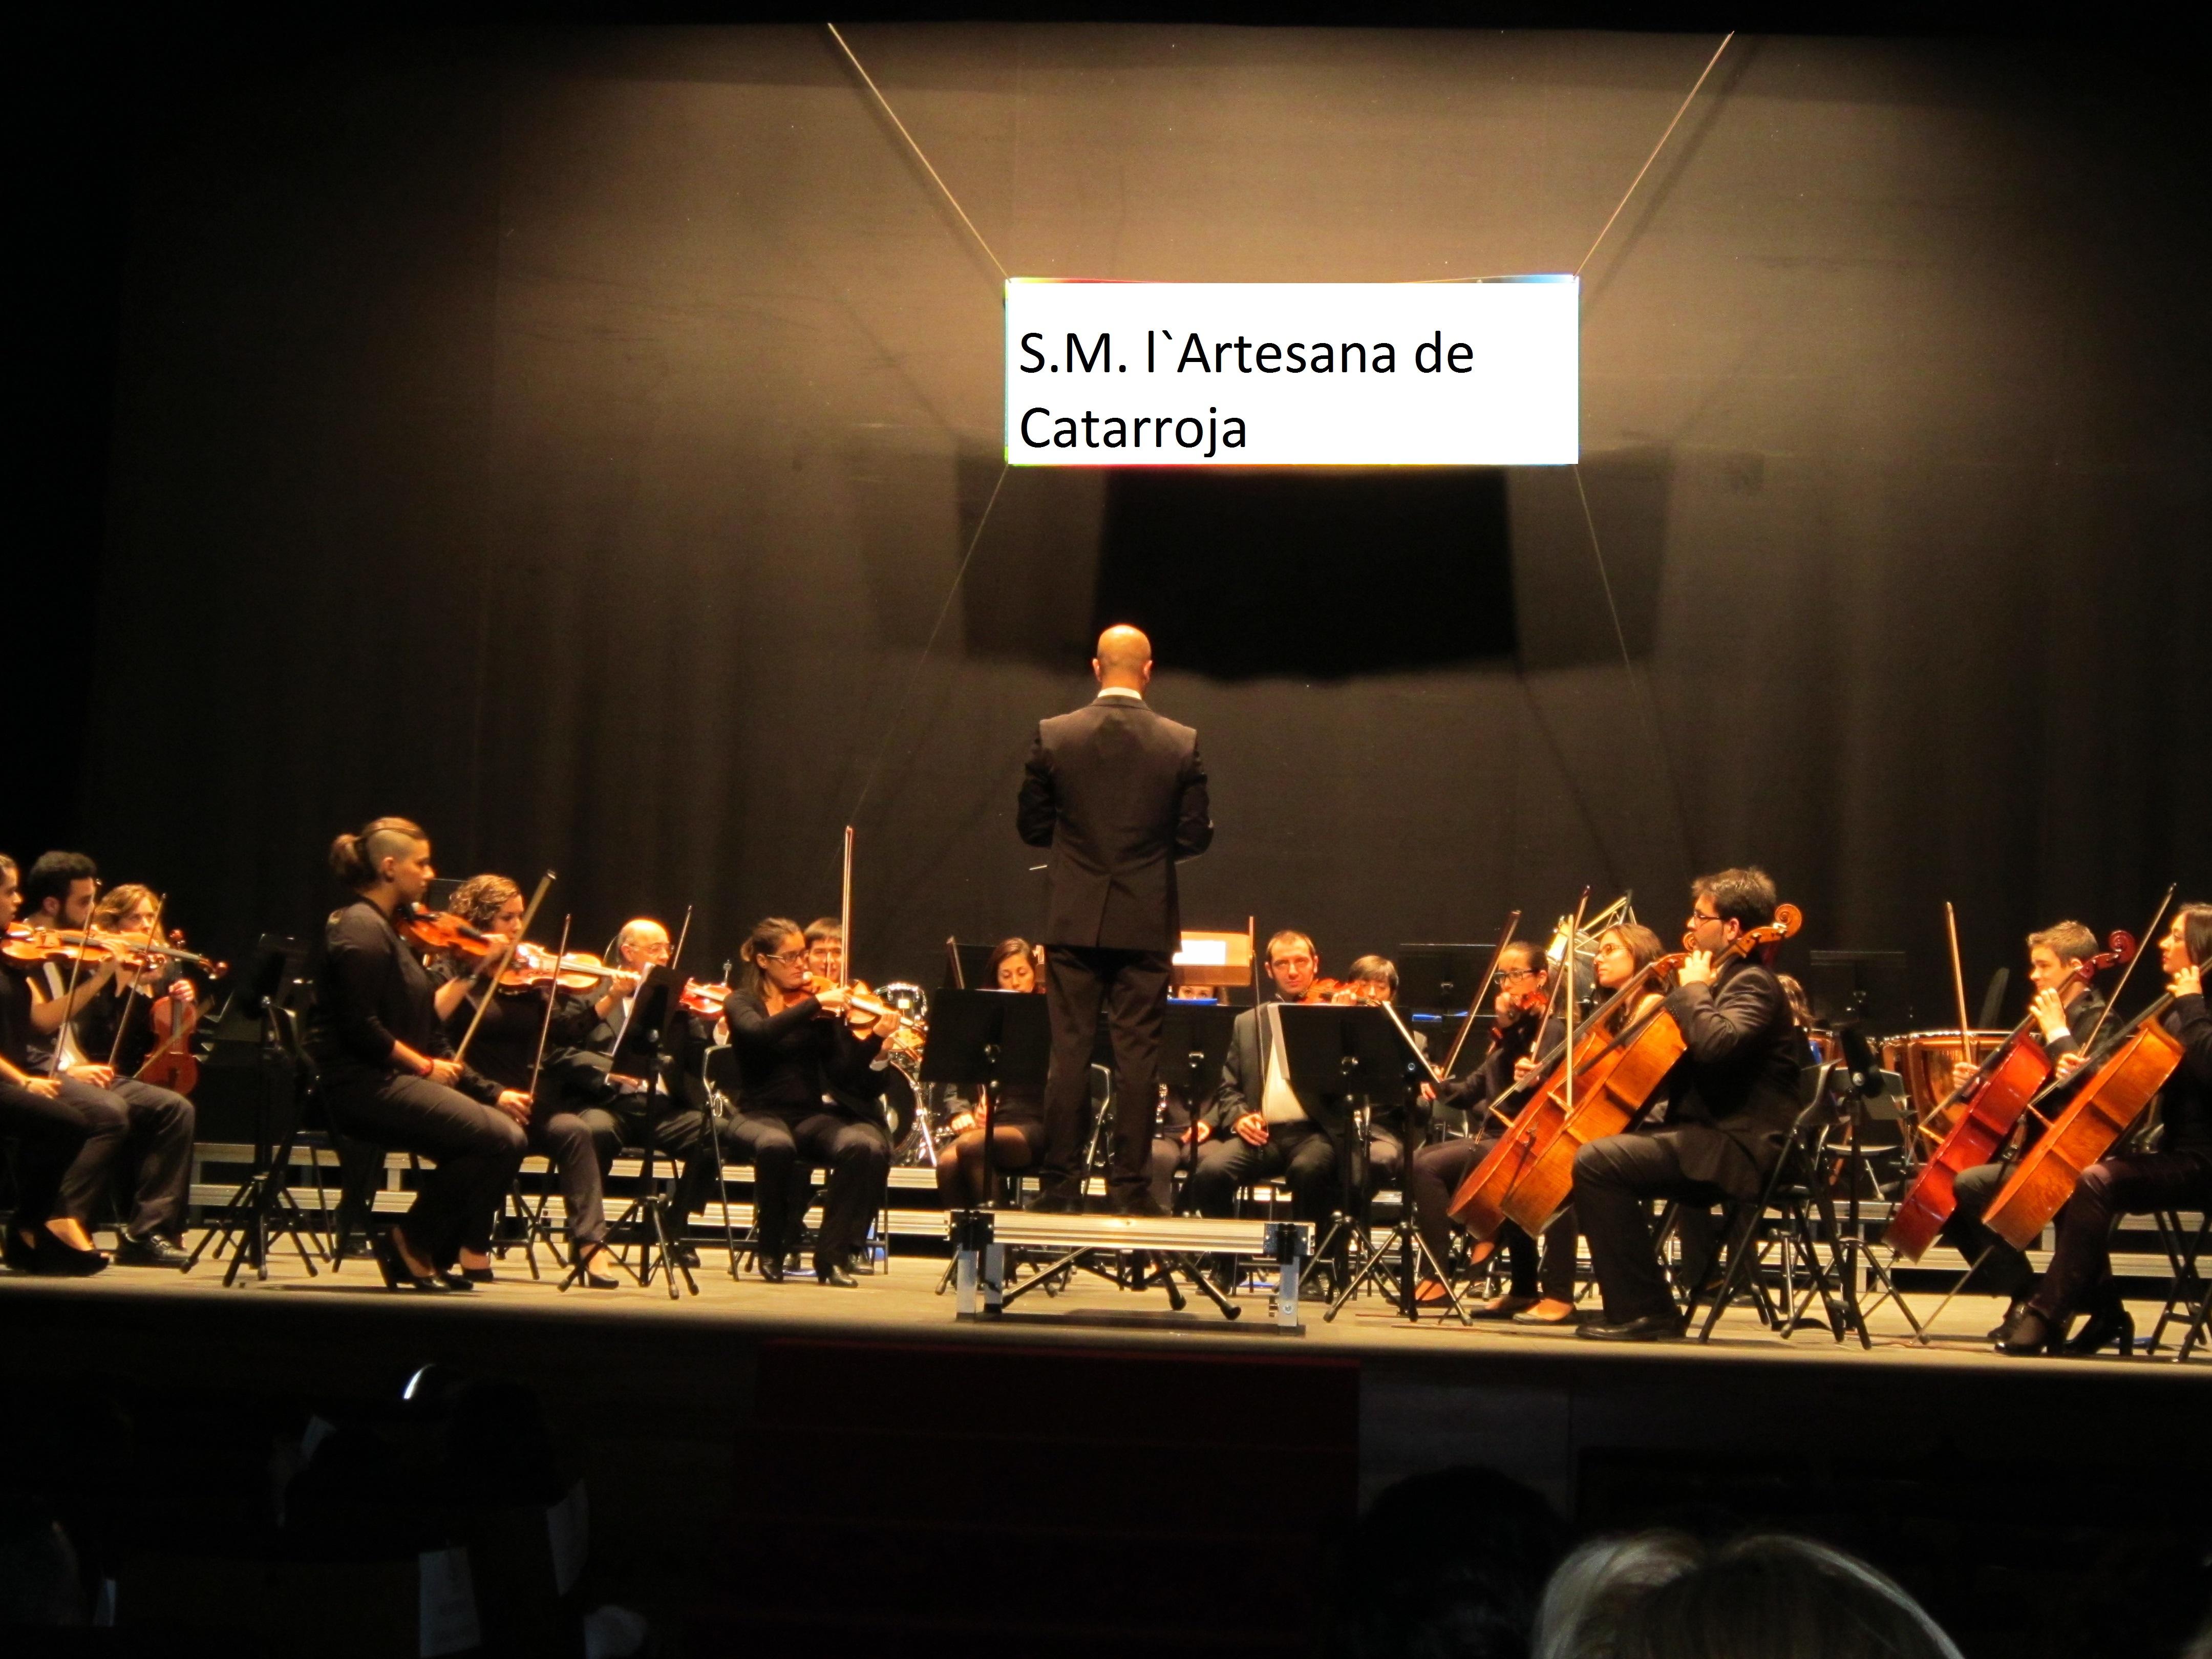 Orquesta Sinfonica S.M. l`Artesana